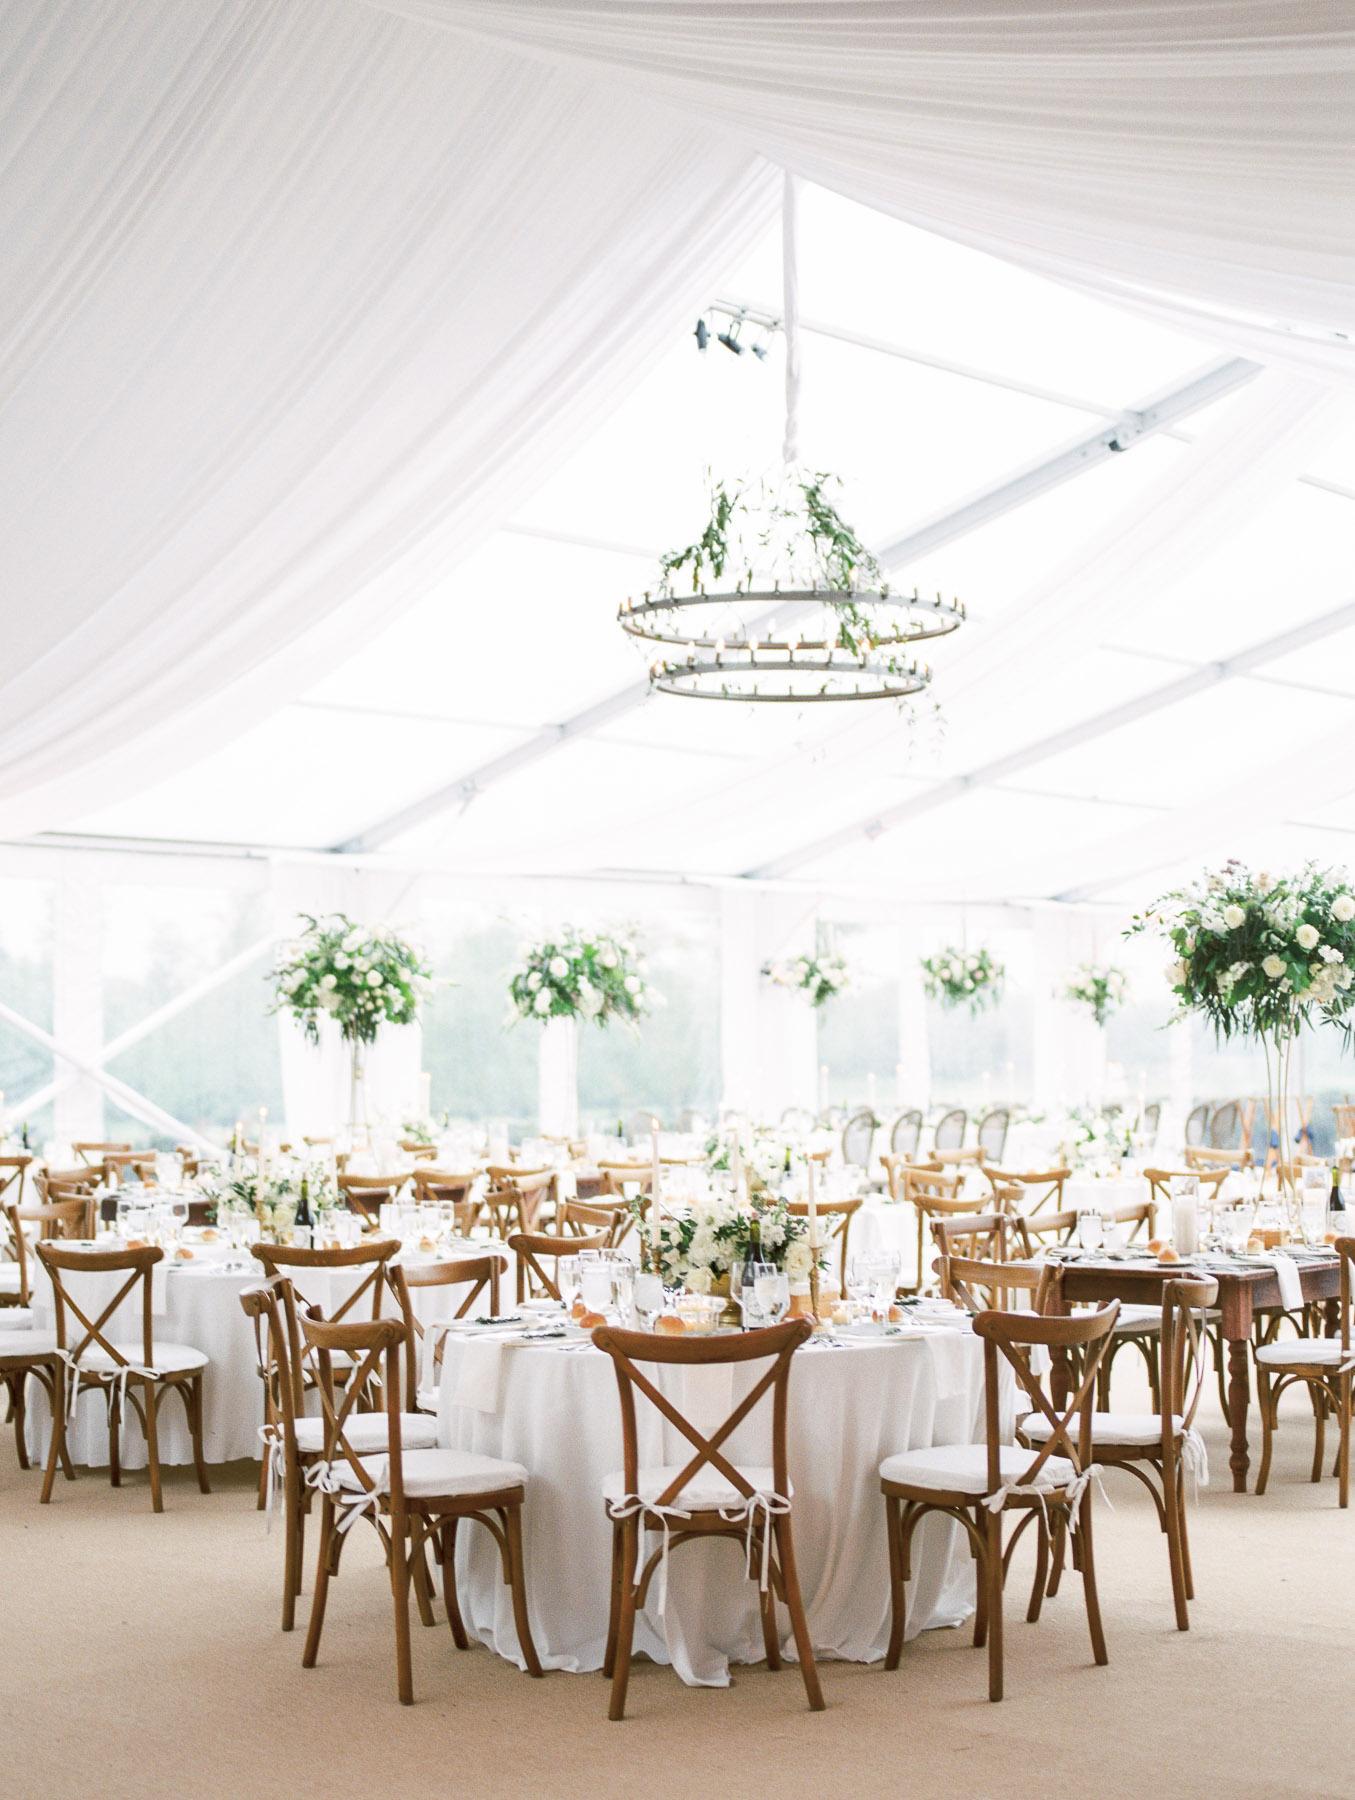 Tented Reception by Renaissance Floral Design